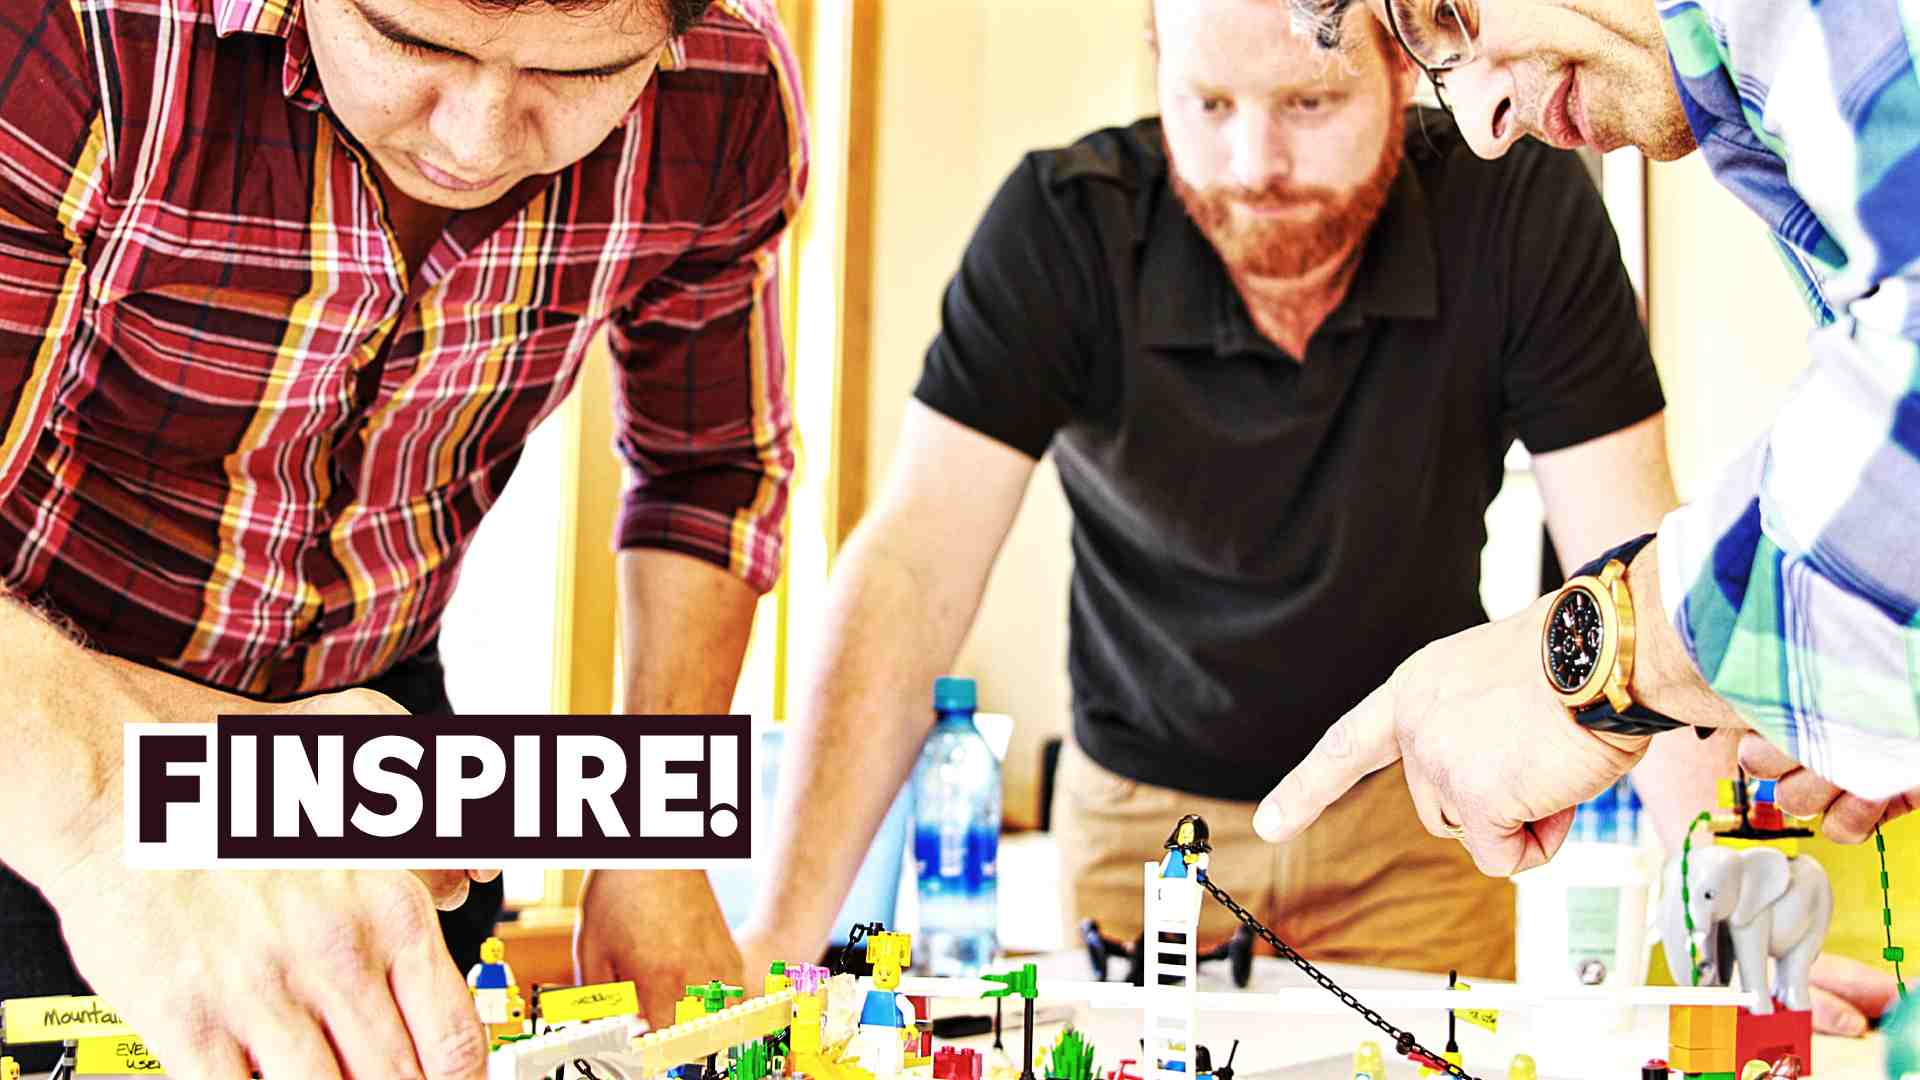 Finspire! – Open Banking